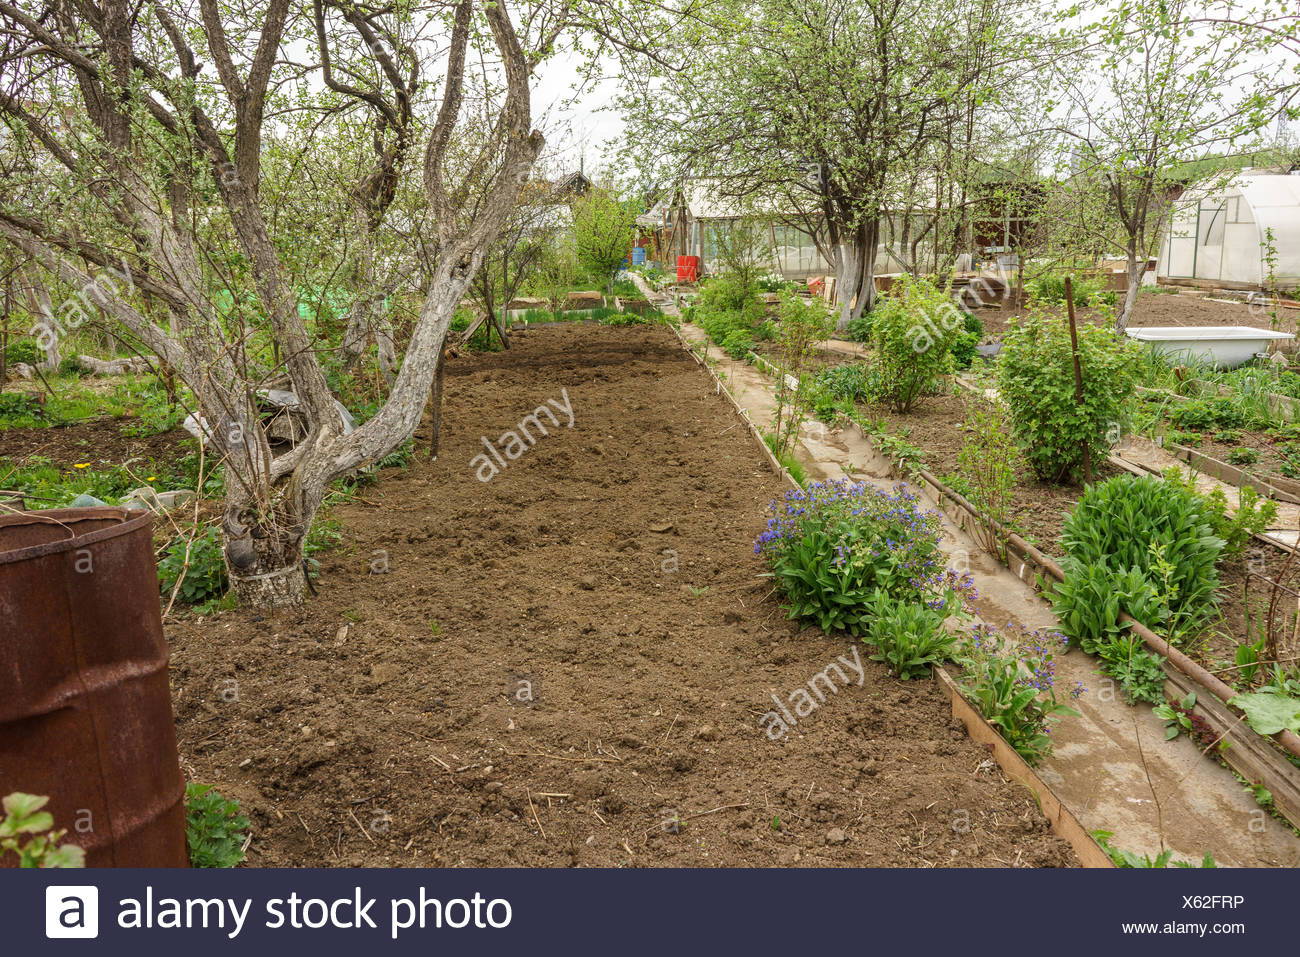 Allotment garden path Stock Photo: 279110154 - Alamy